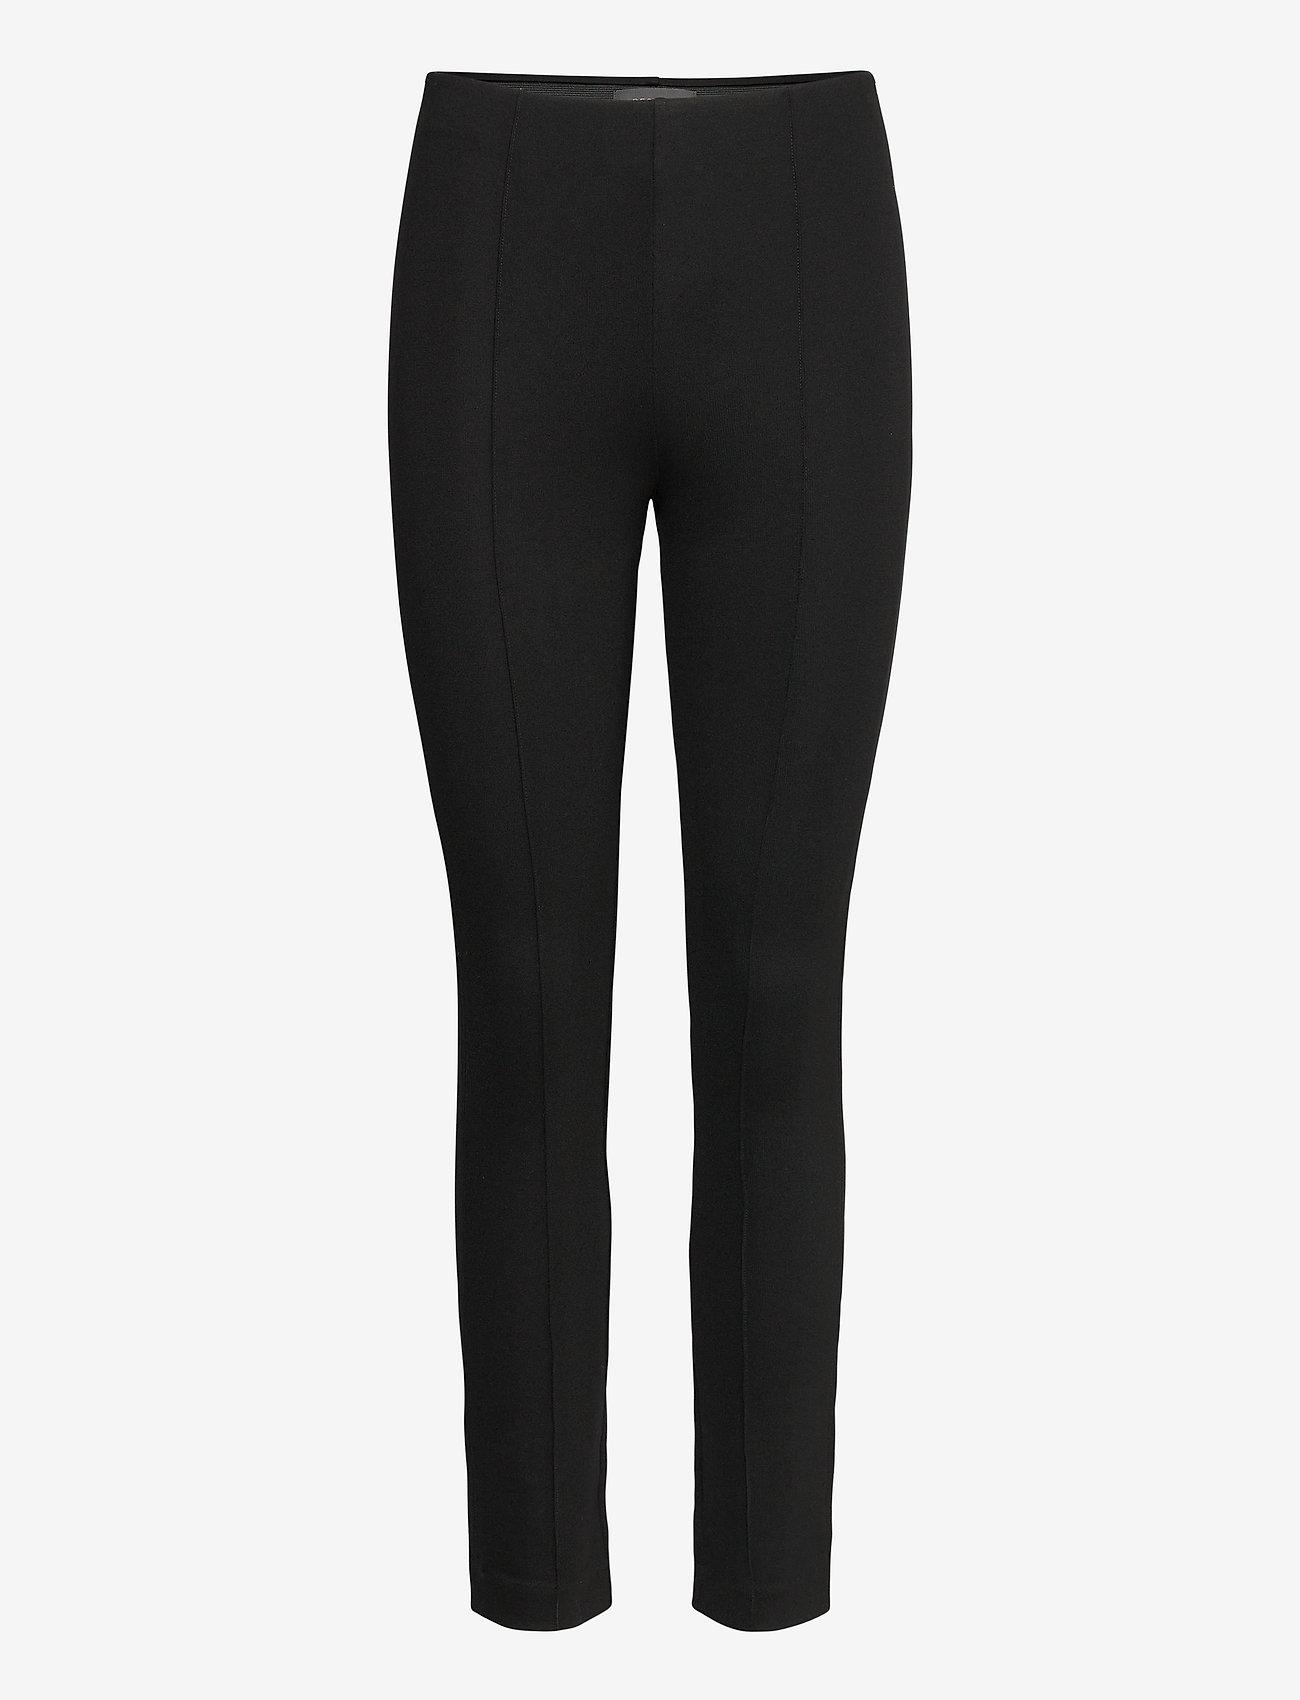 Residus - LOU STRAIGHT PANT - pantalons casual - black - 1